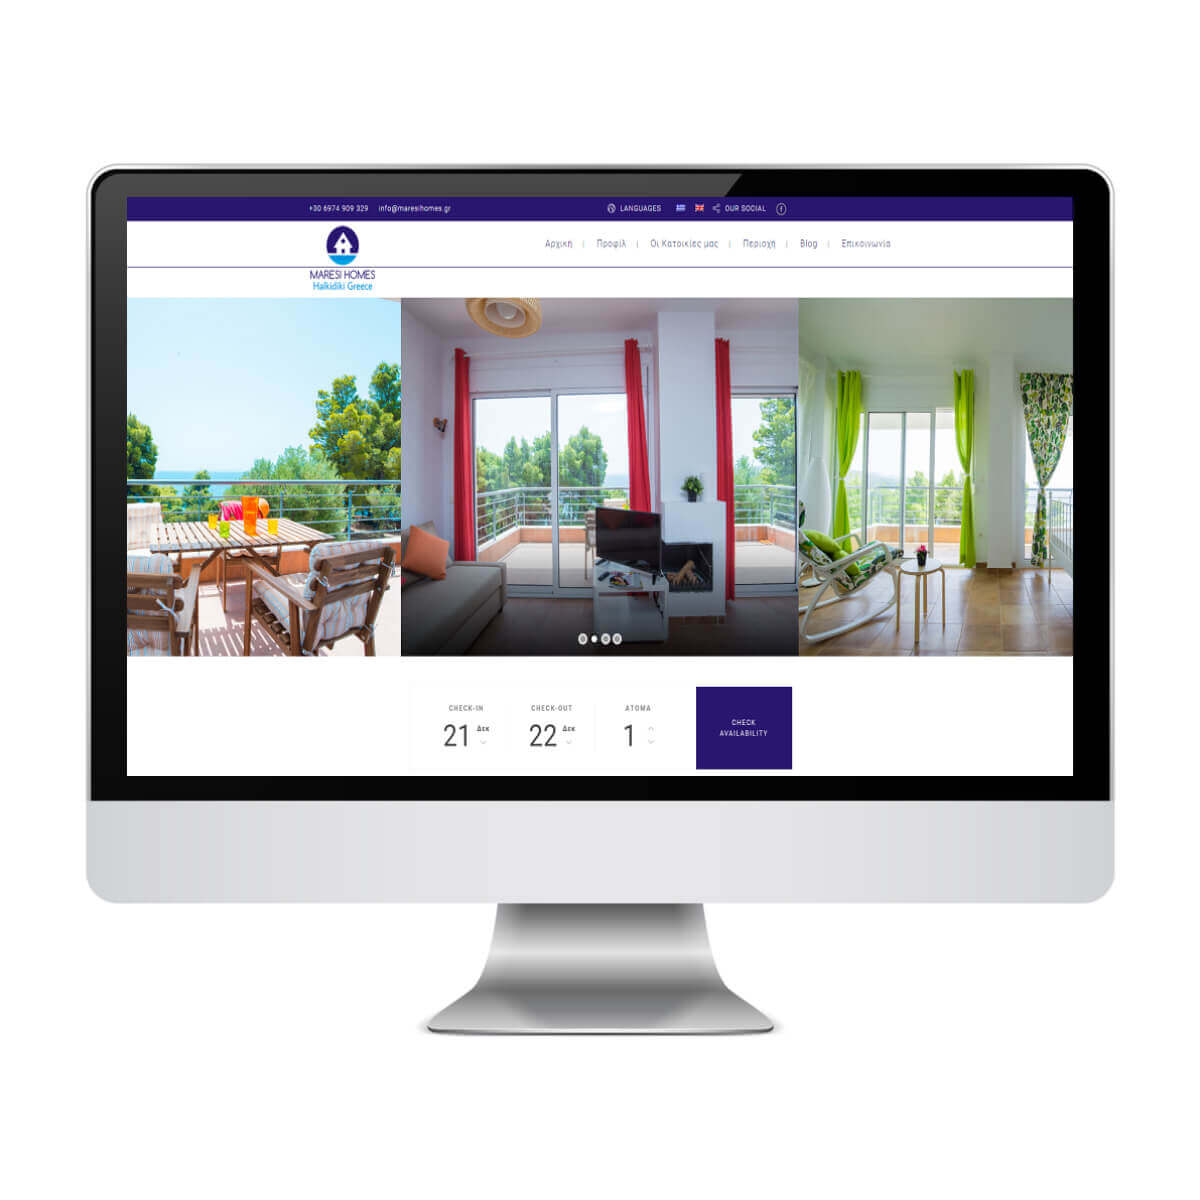 Maresi - Κατασκευή Ιστοσελίδων για Ξενοδοχεία - SmartWebDesign